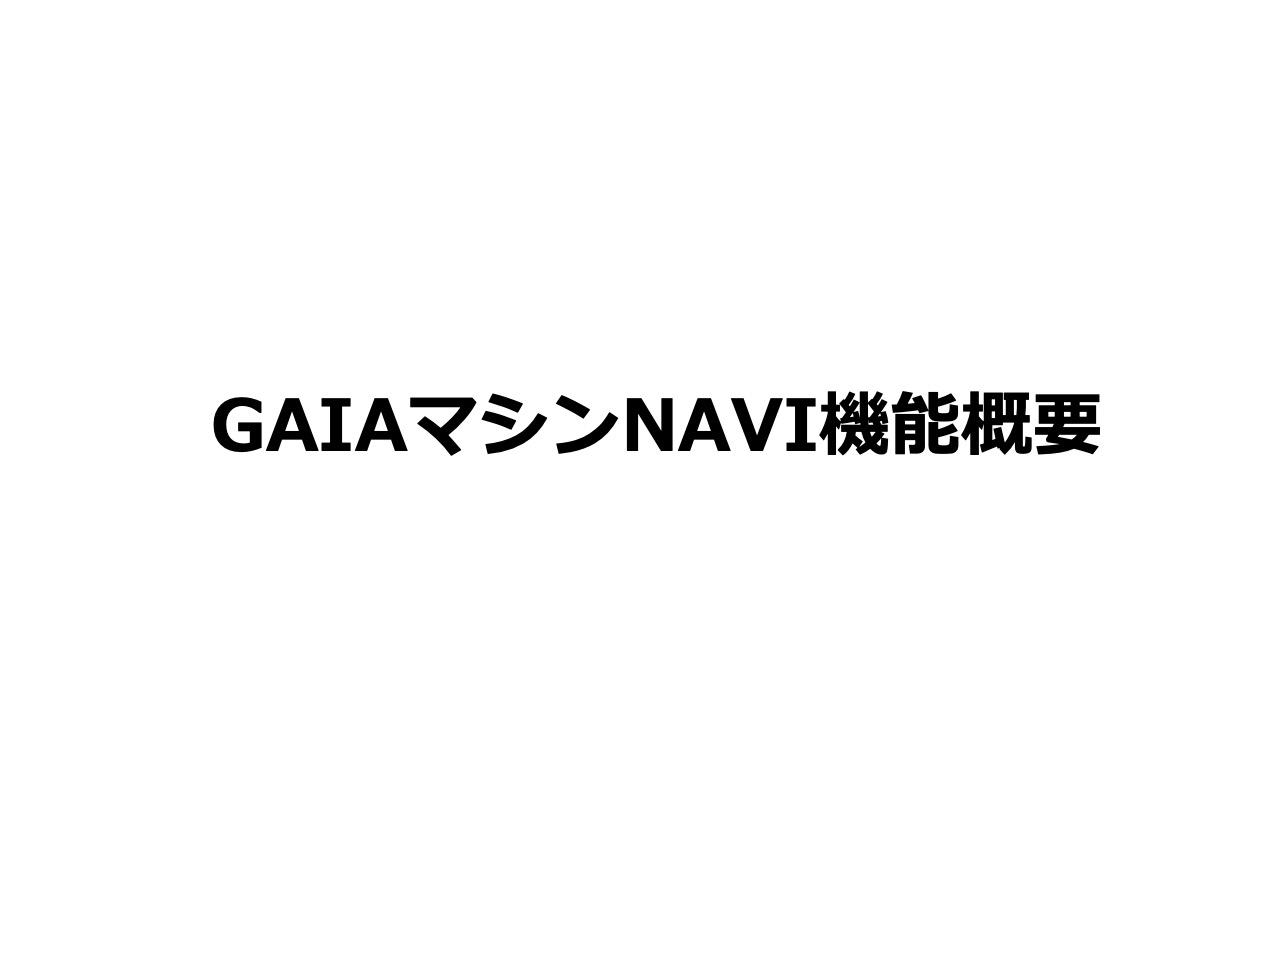 04-GAIAマシンNAVI機能概要20200507pptx